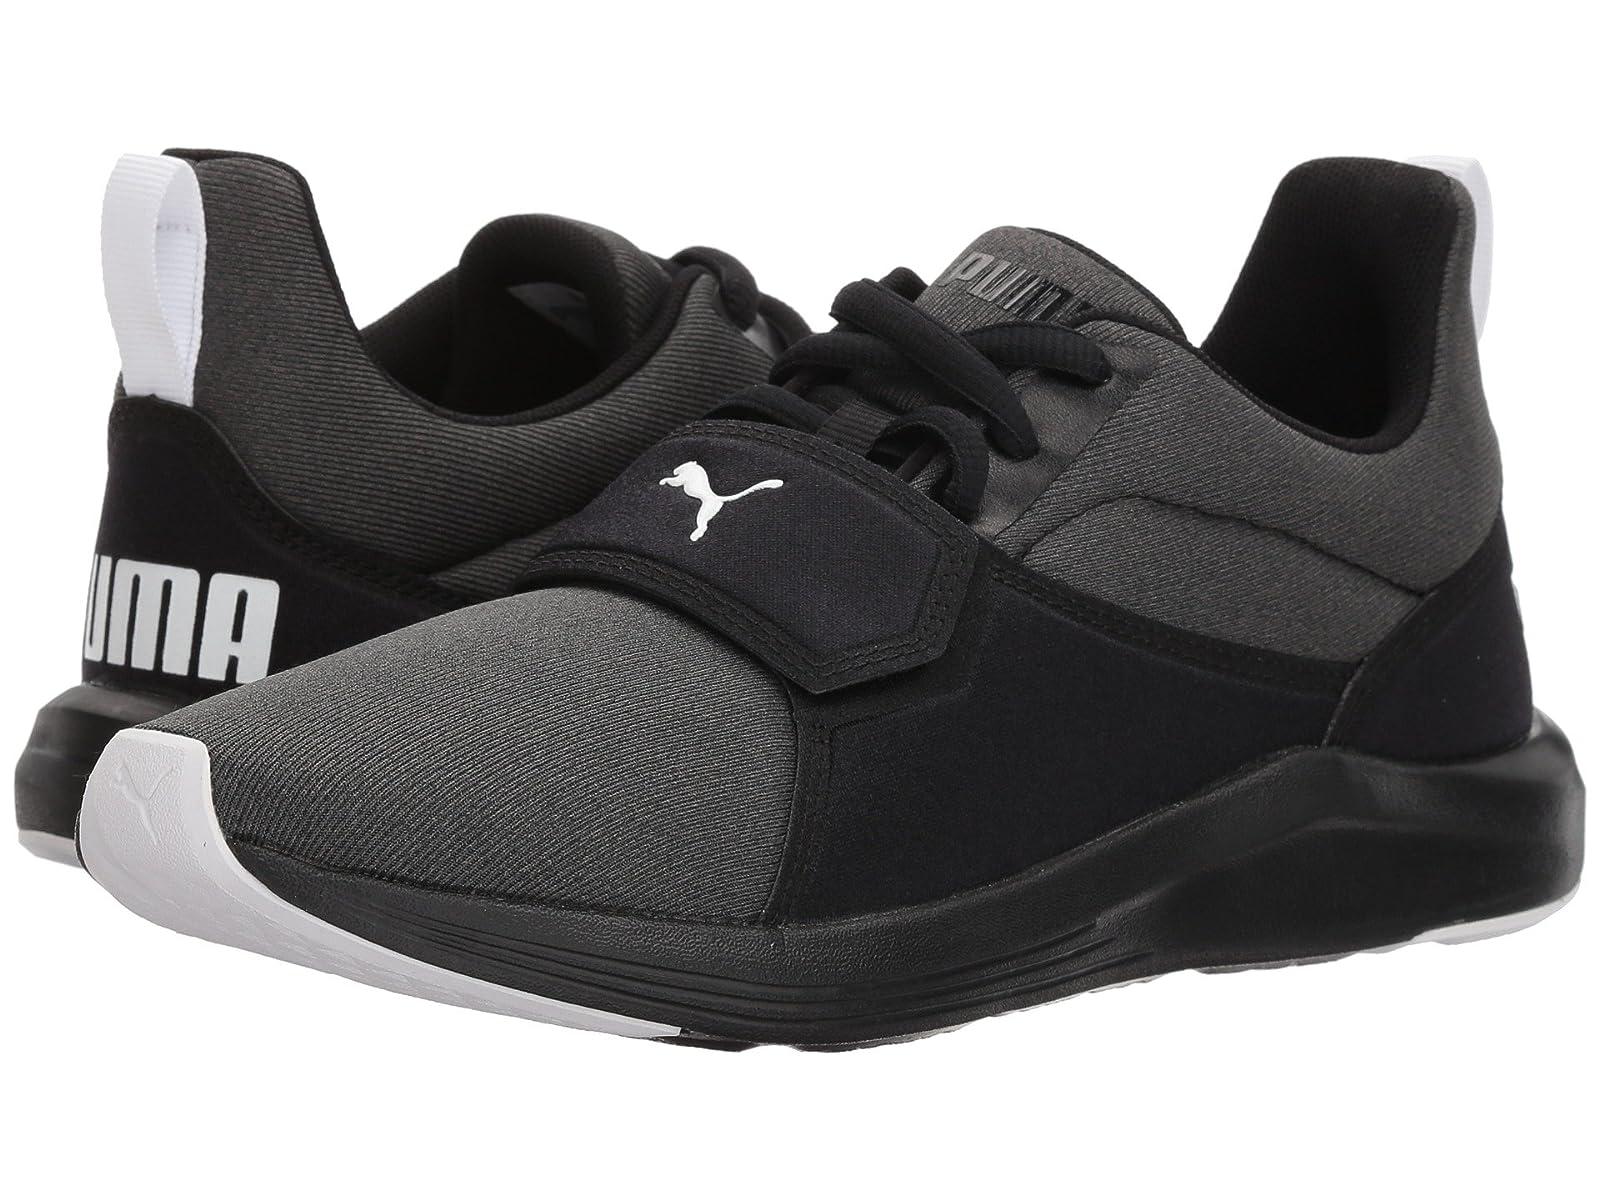 PUMA ProdigyAtmospheric grades have affordable shoes